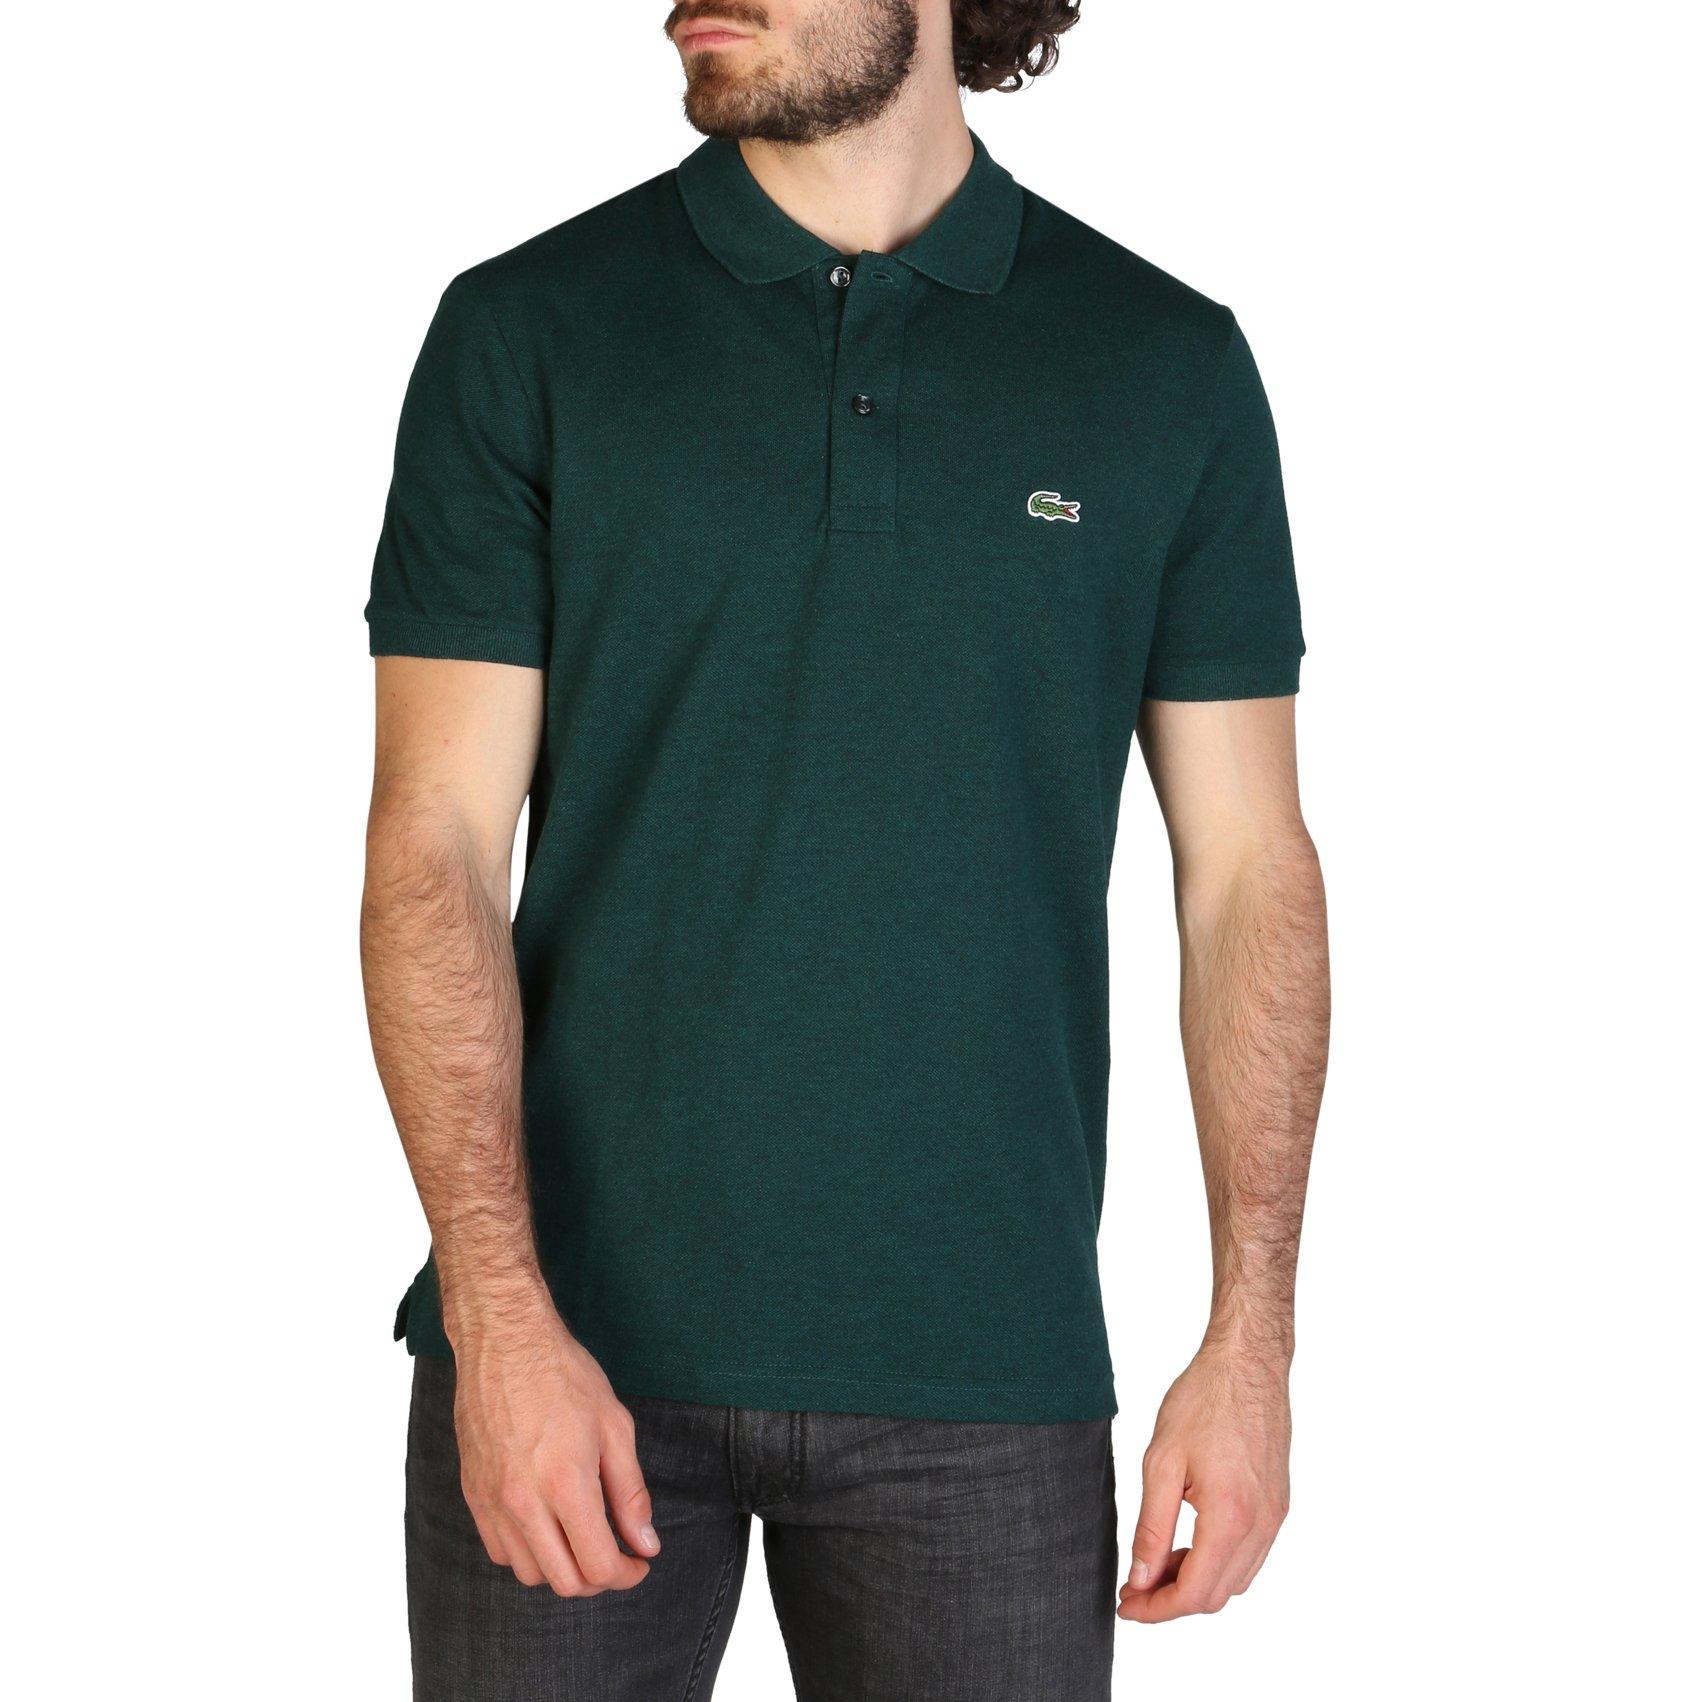 Lacoste Men's Polo Shirt Various Colours PH4012_SLIM - green S